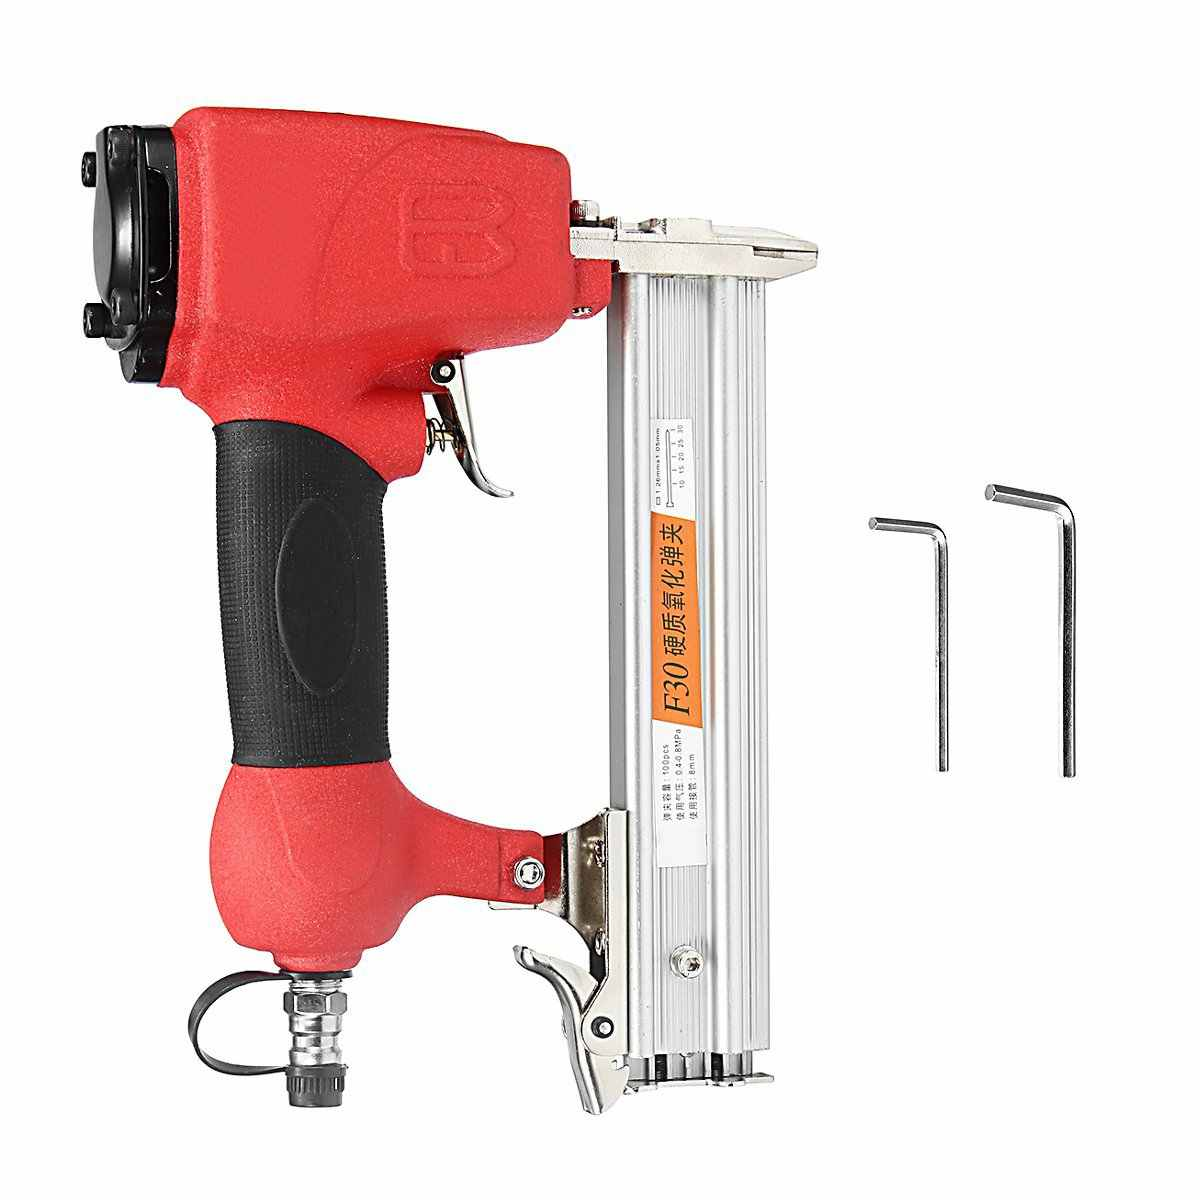 Draadloze Elektrische Nagelpistool Lucht Nagelpistool Nietje Guns Straight Nail 10-30mm Houtbewerking Framing Gereedschap Power Tools Huis Renovatie